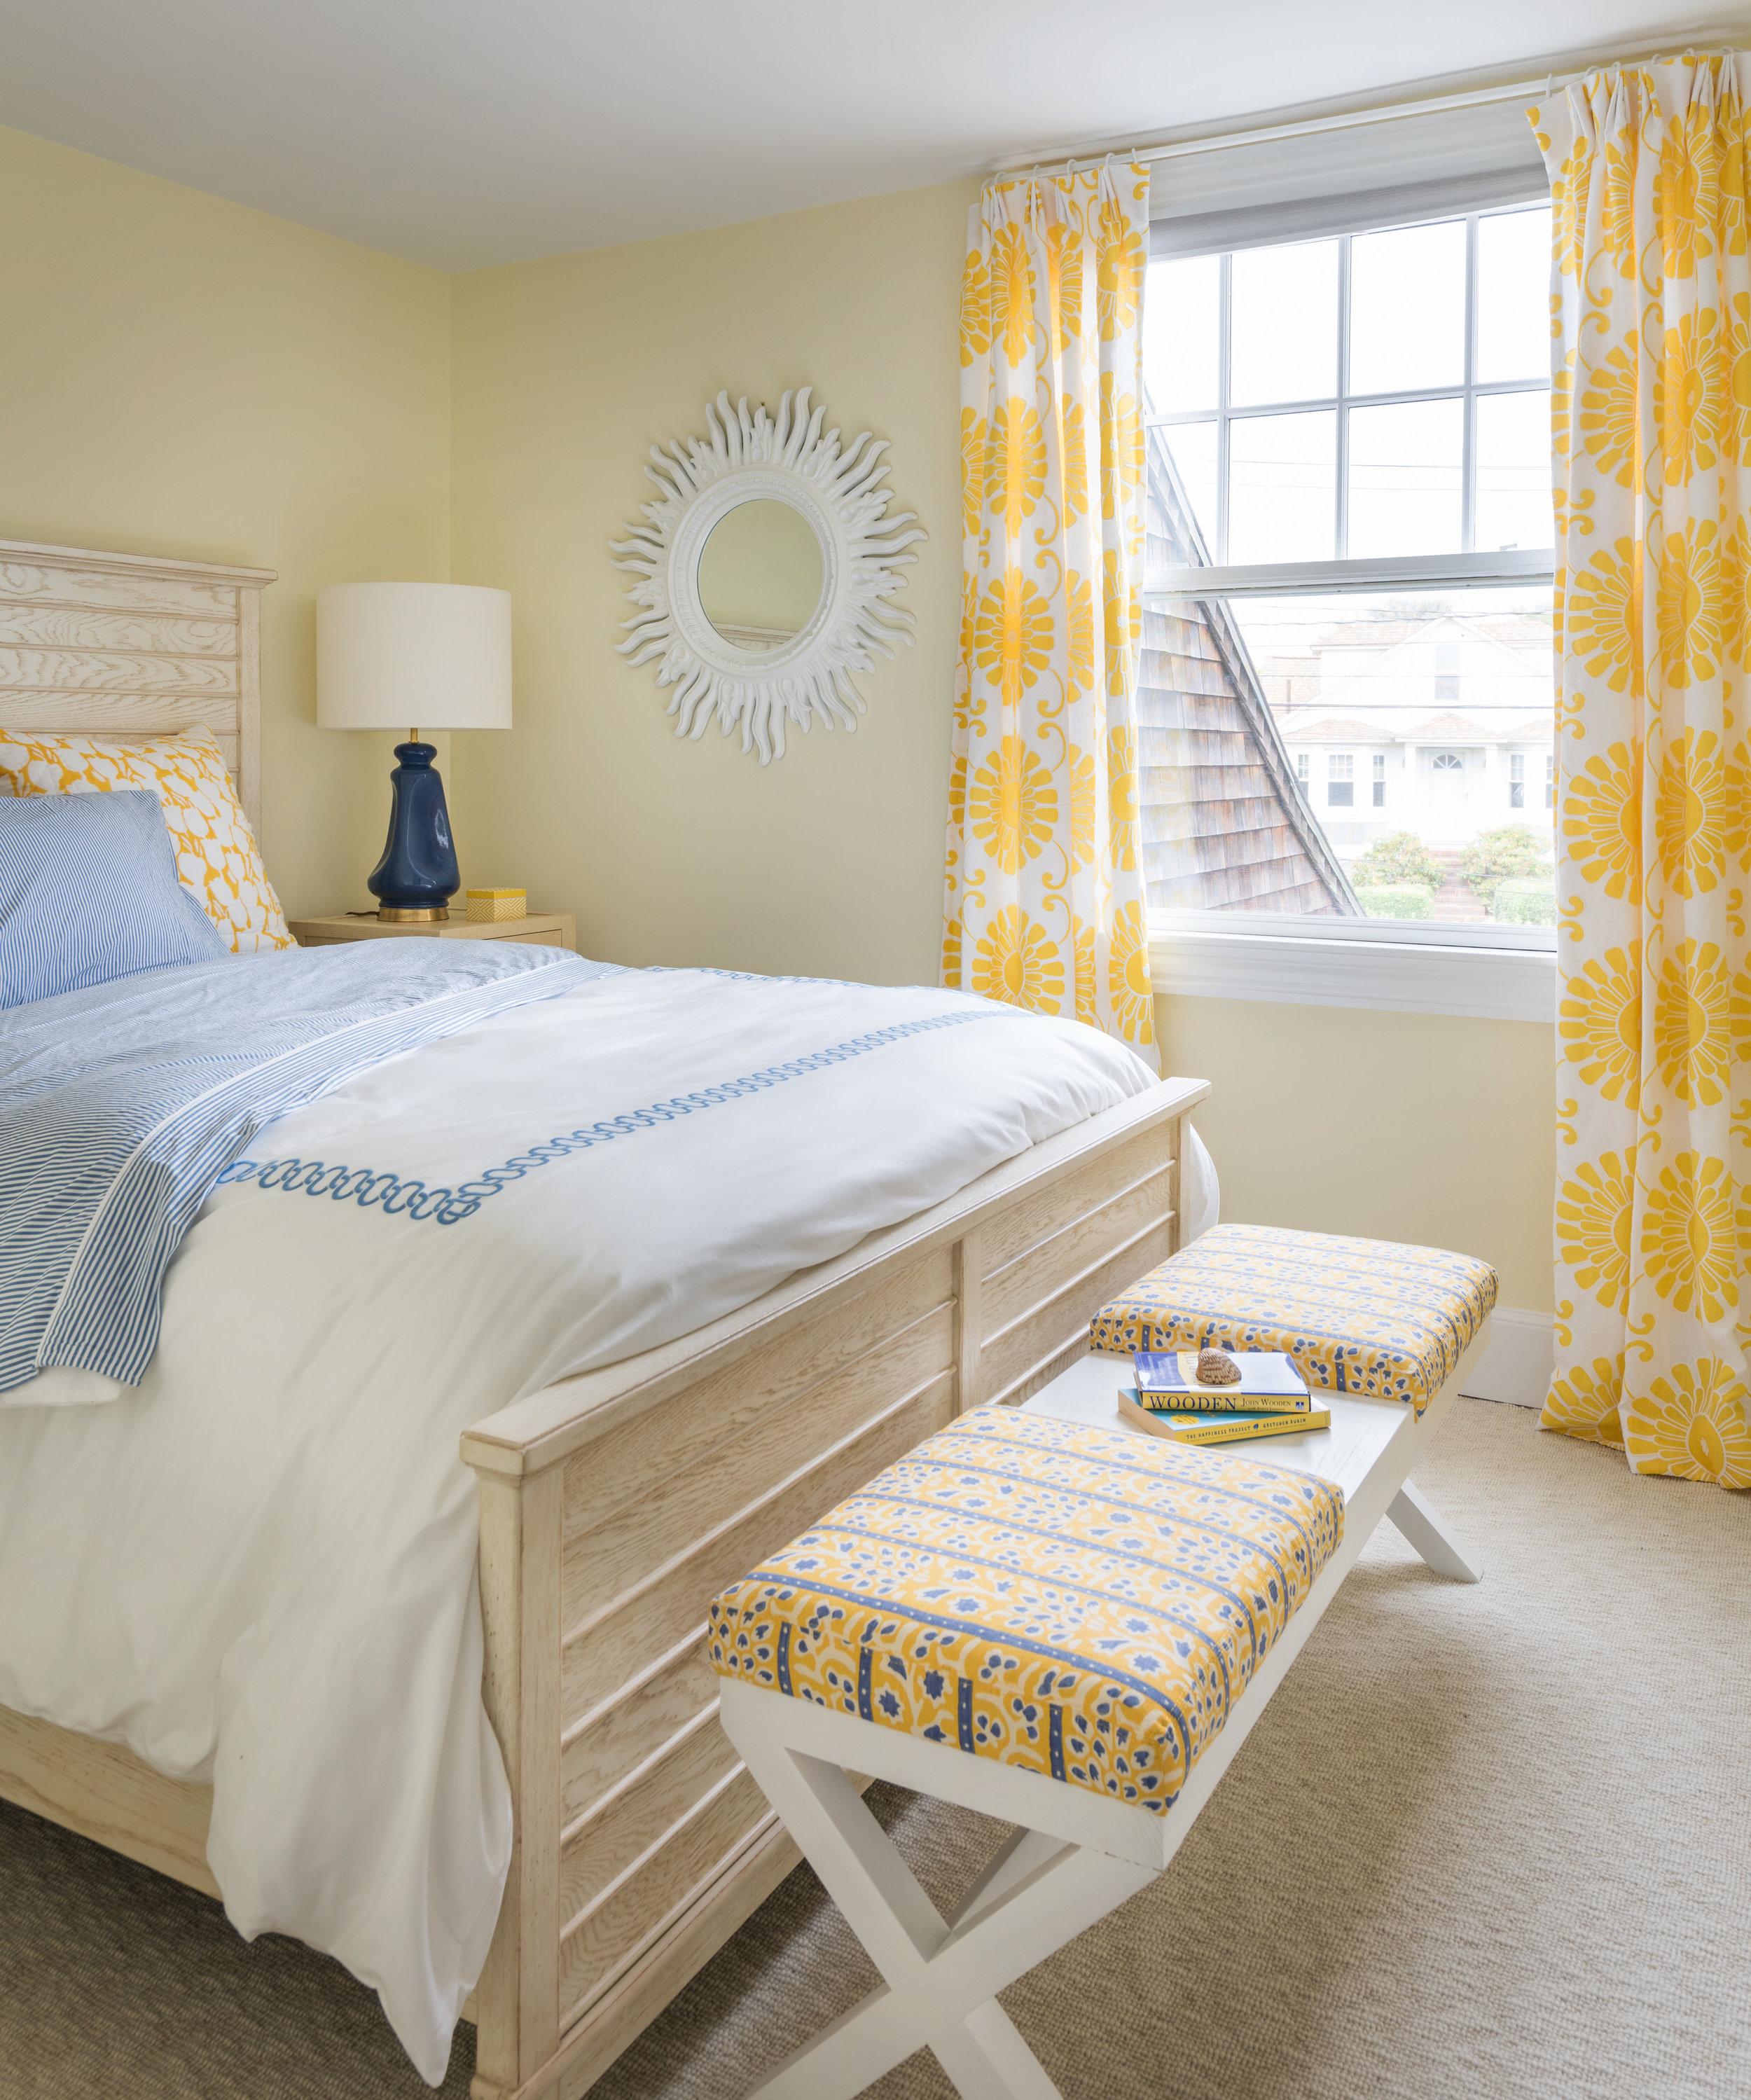 interior design, Rhode Island, Newport, yellow and blue, bedroom decor, beach style